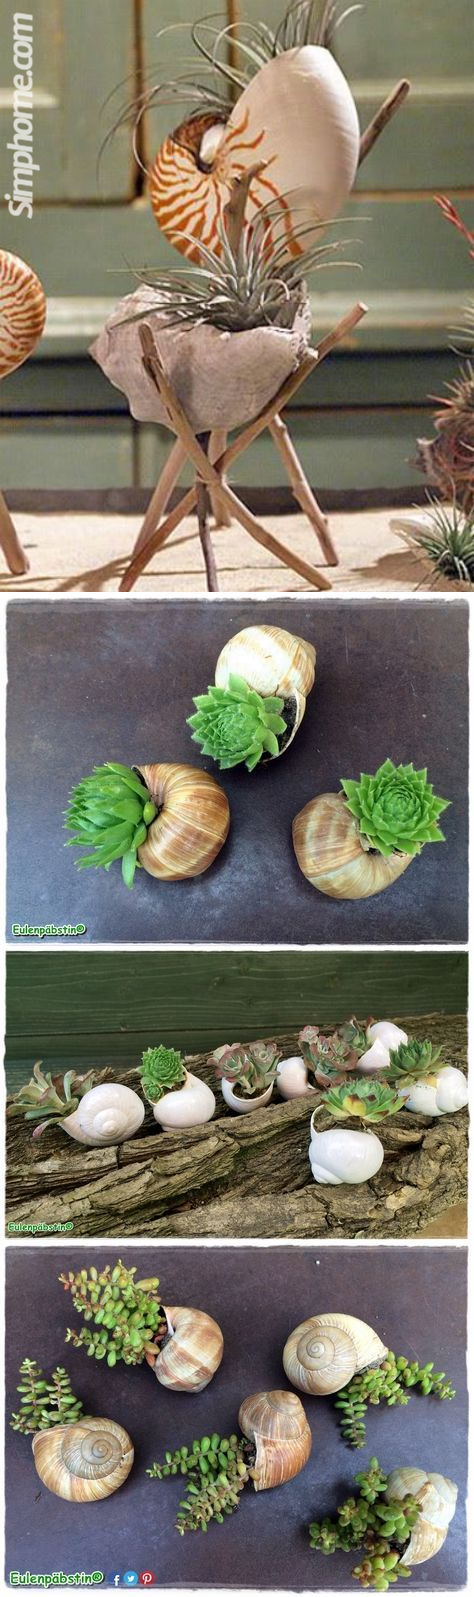 3 Seashell2BPlanters simphome com